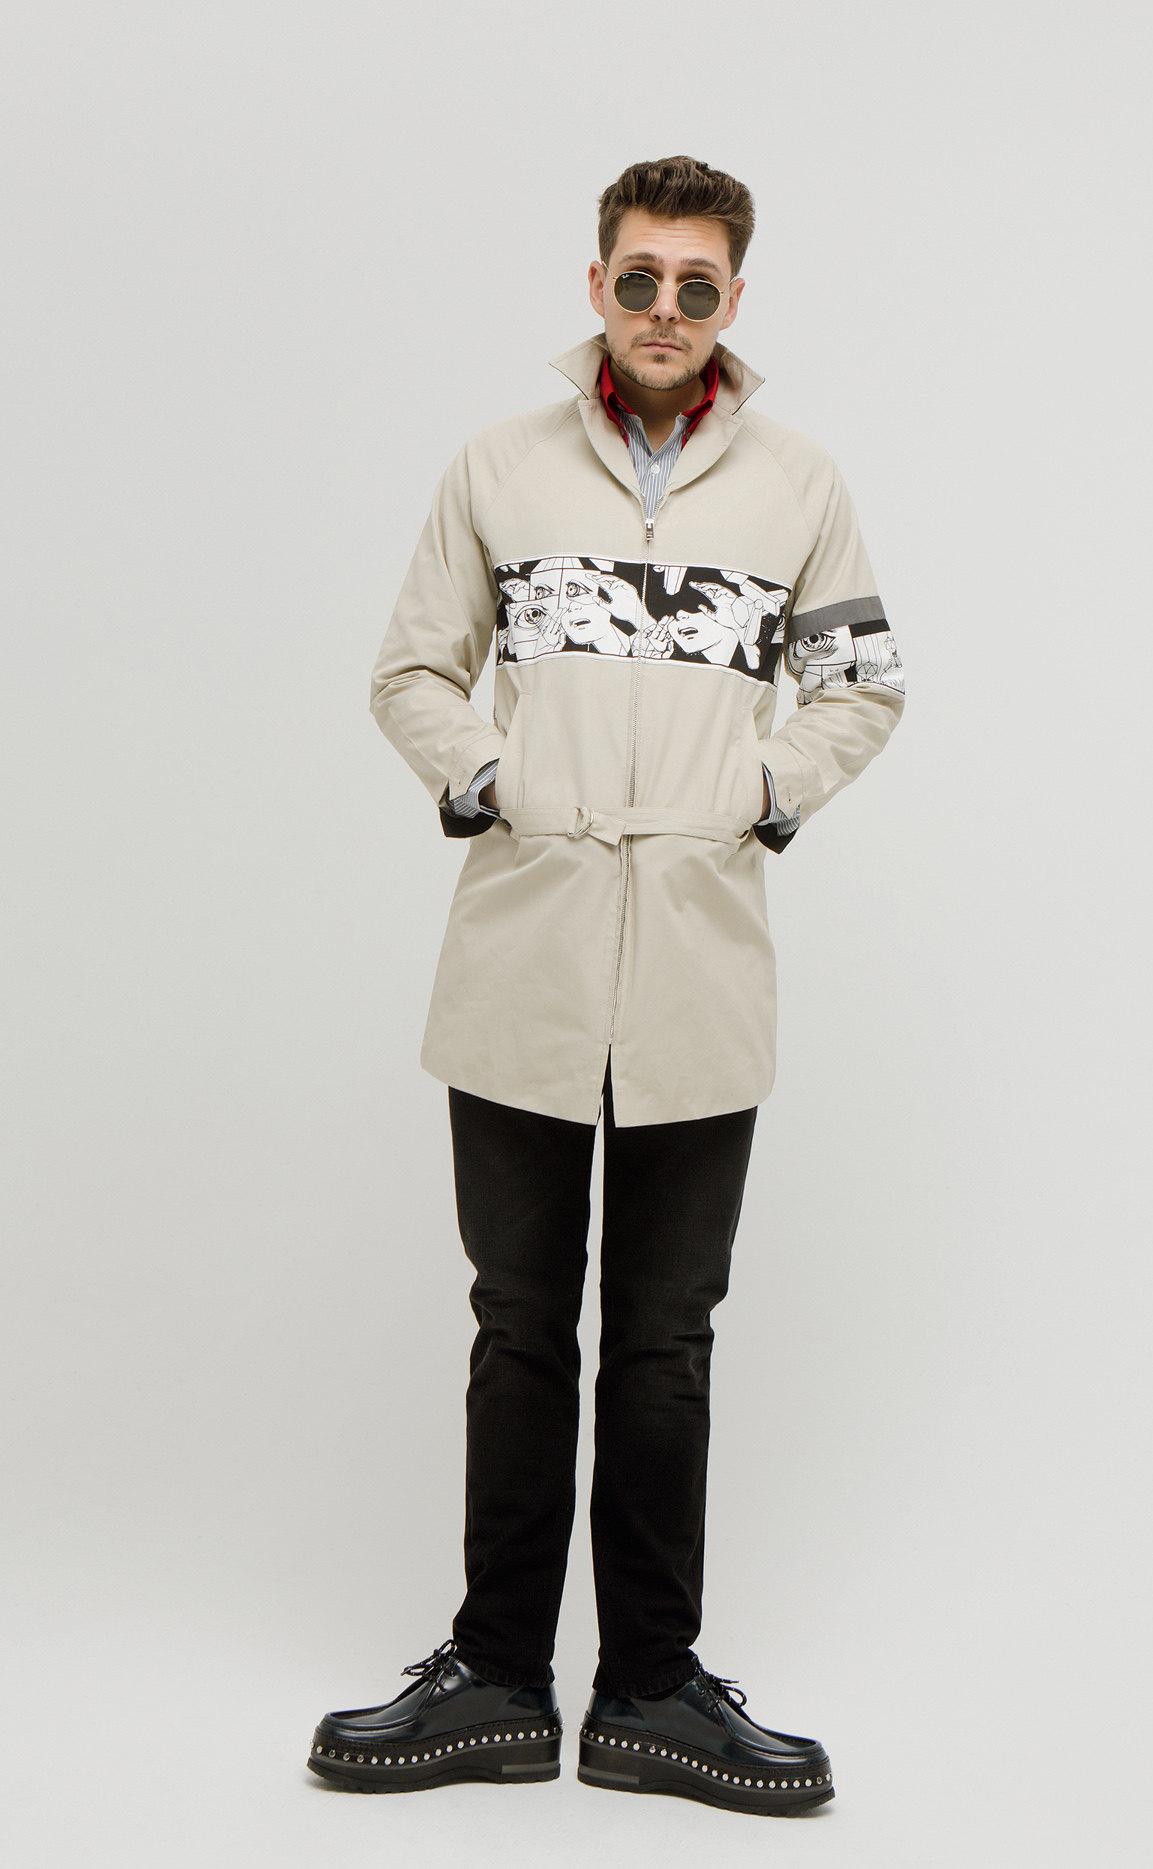 рубашка, все Prada, джинсы Dolce & Gabbana, ботинки Louis Vuitton, очки Ray-Ban